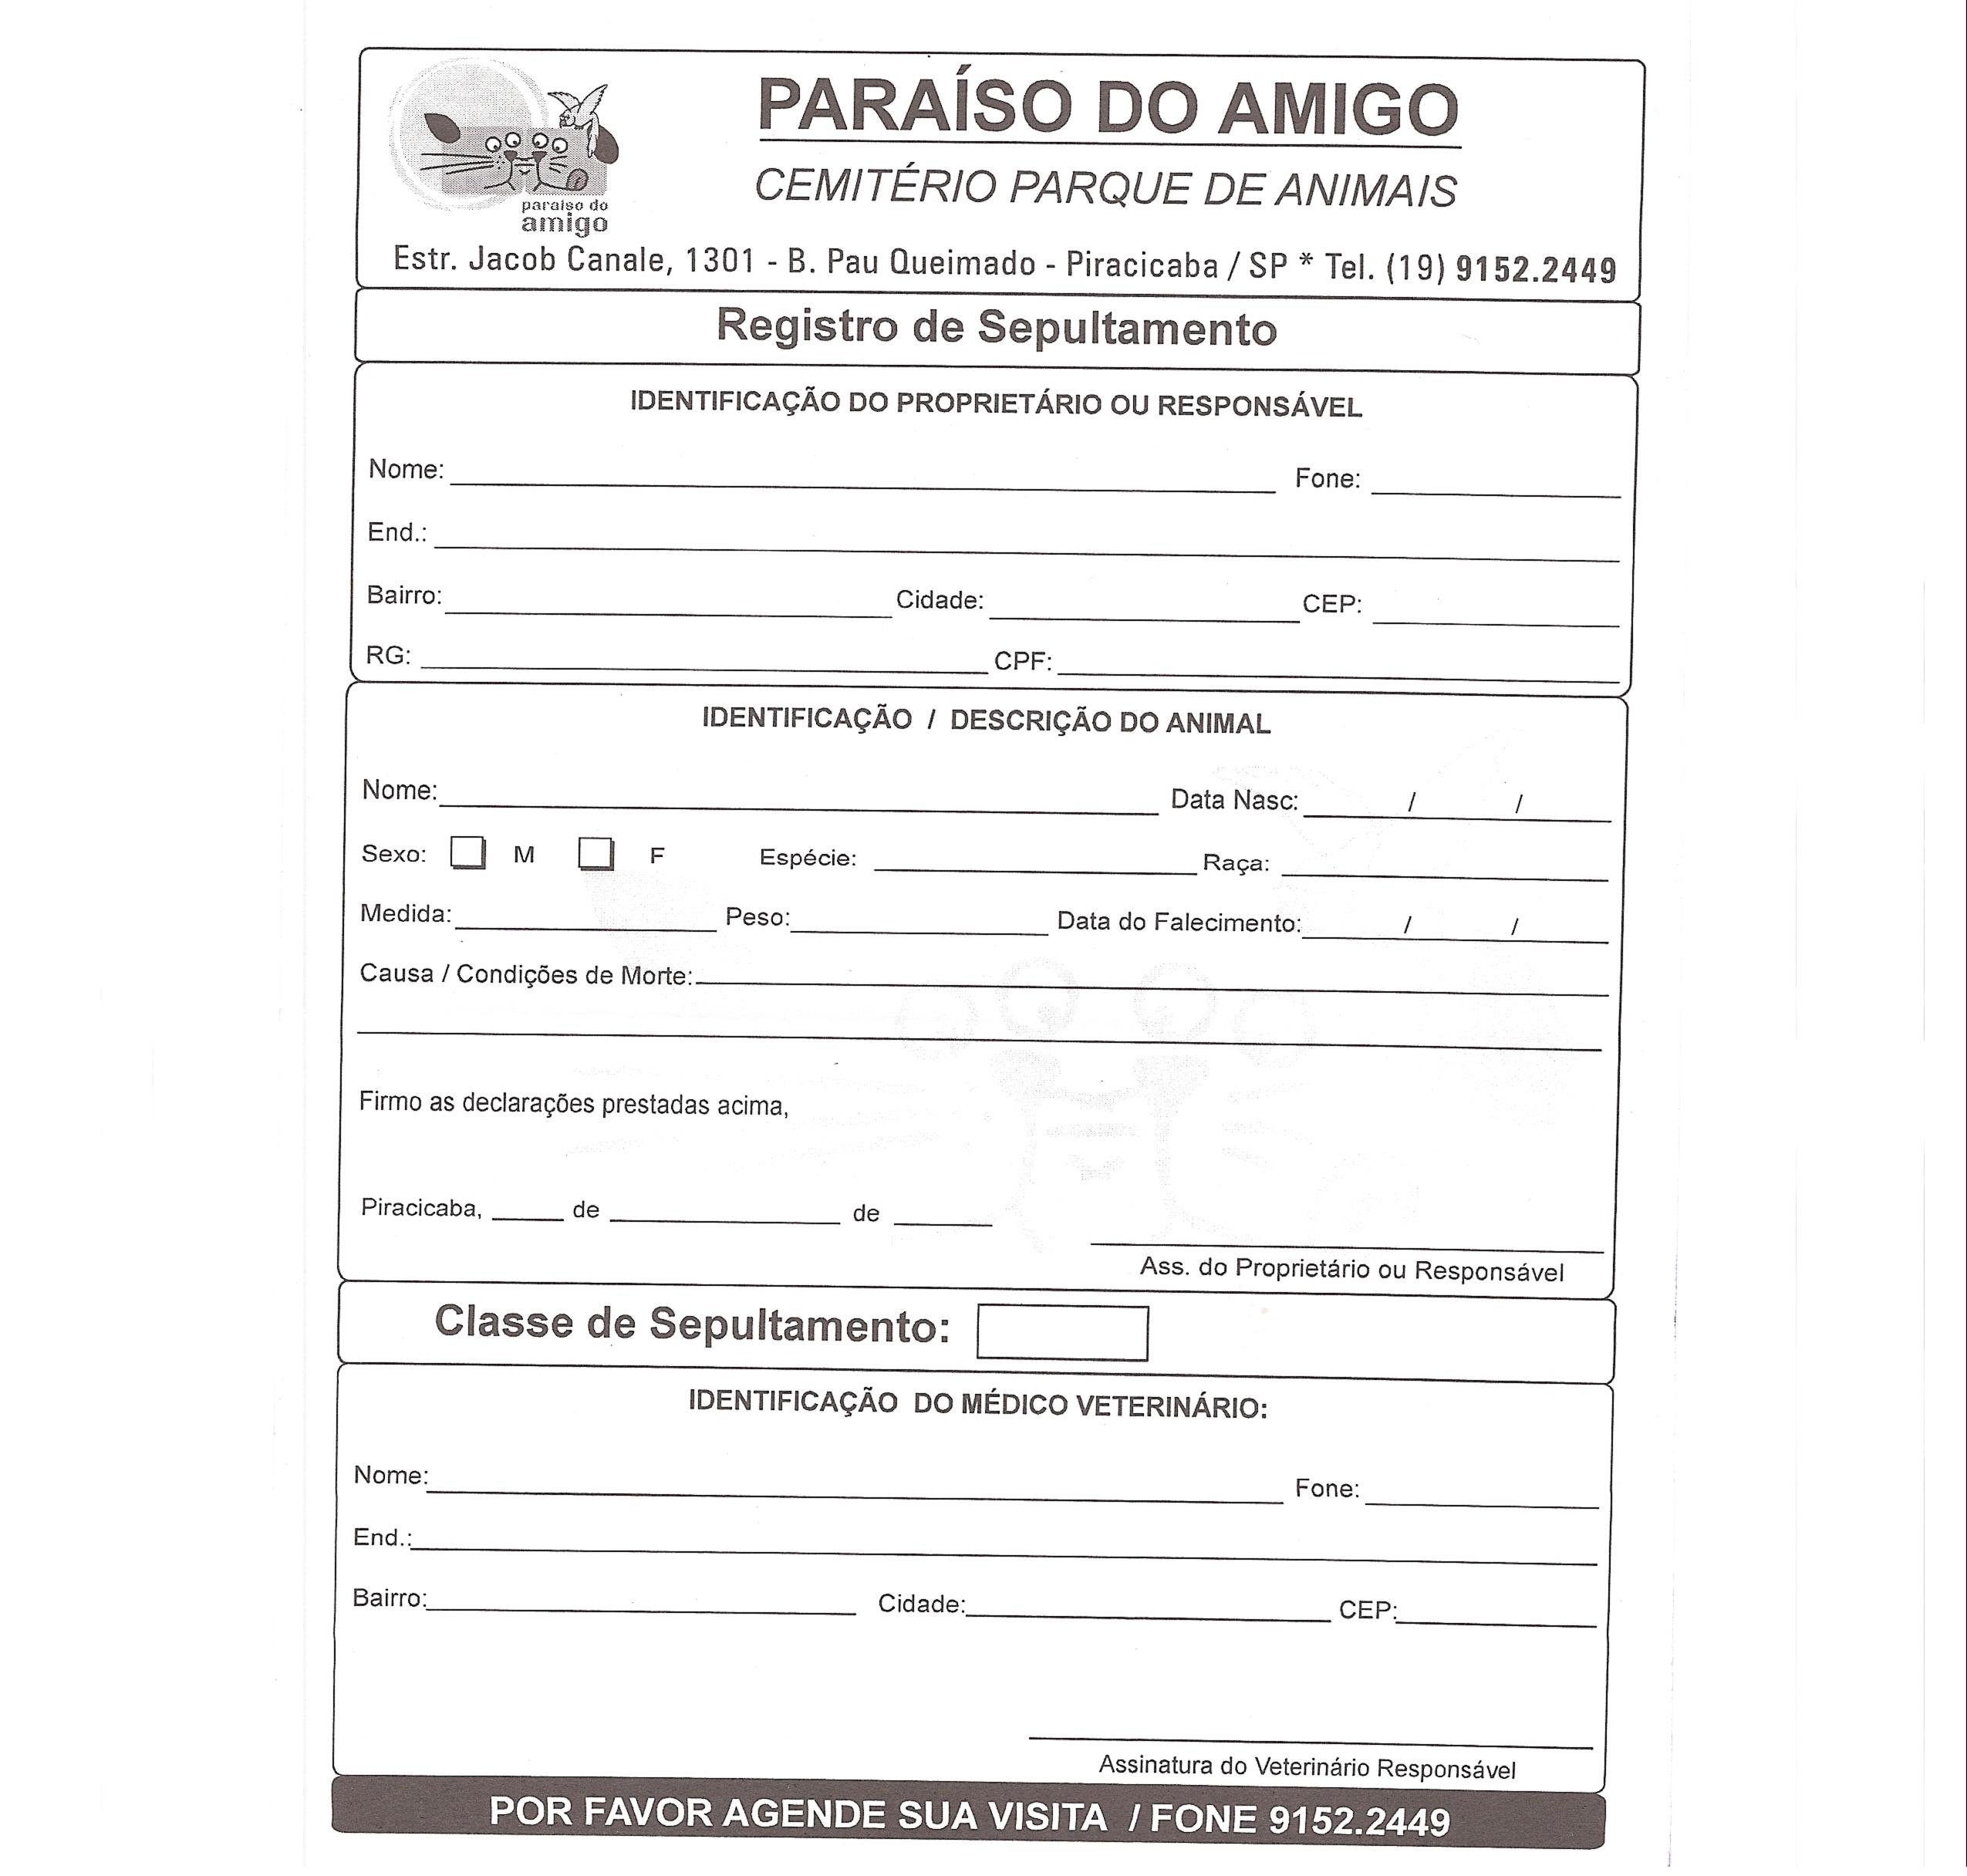 doc_registro.jpg